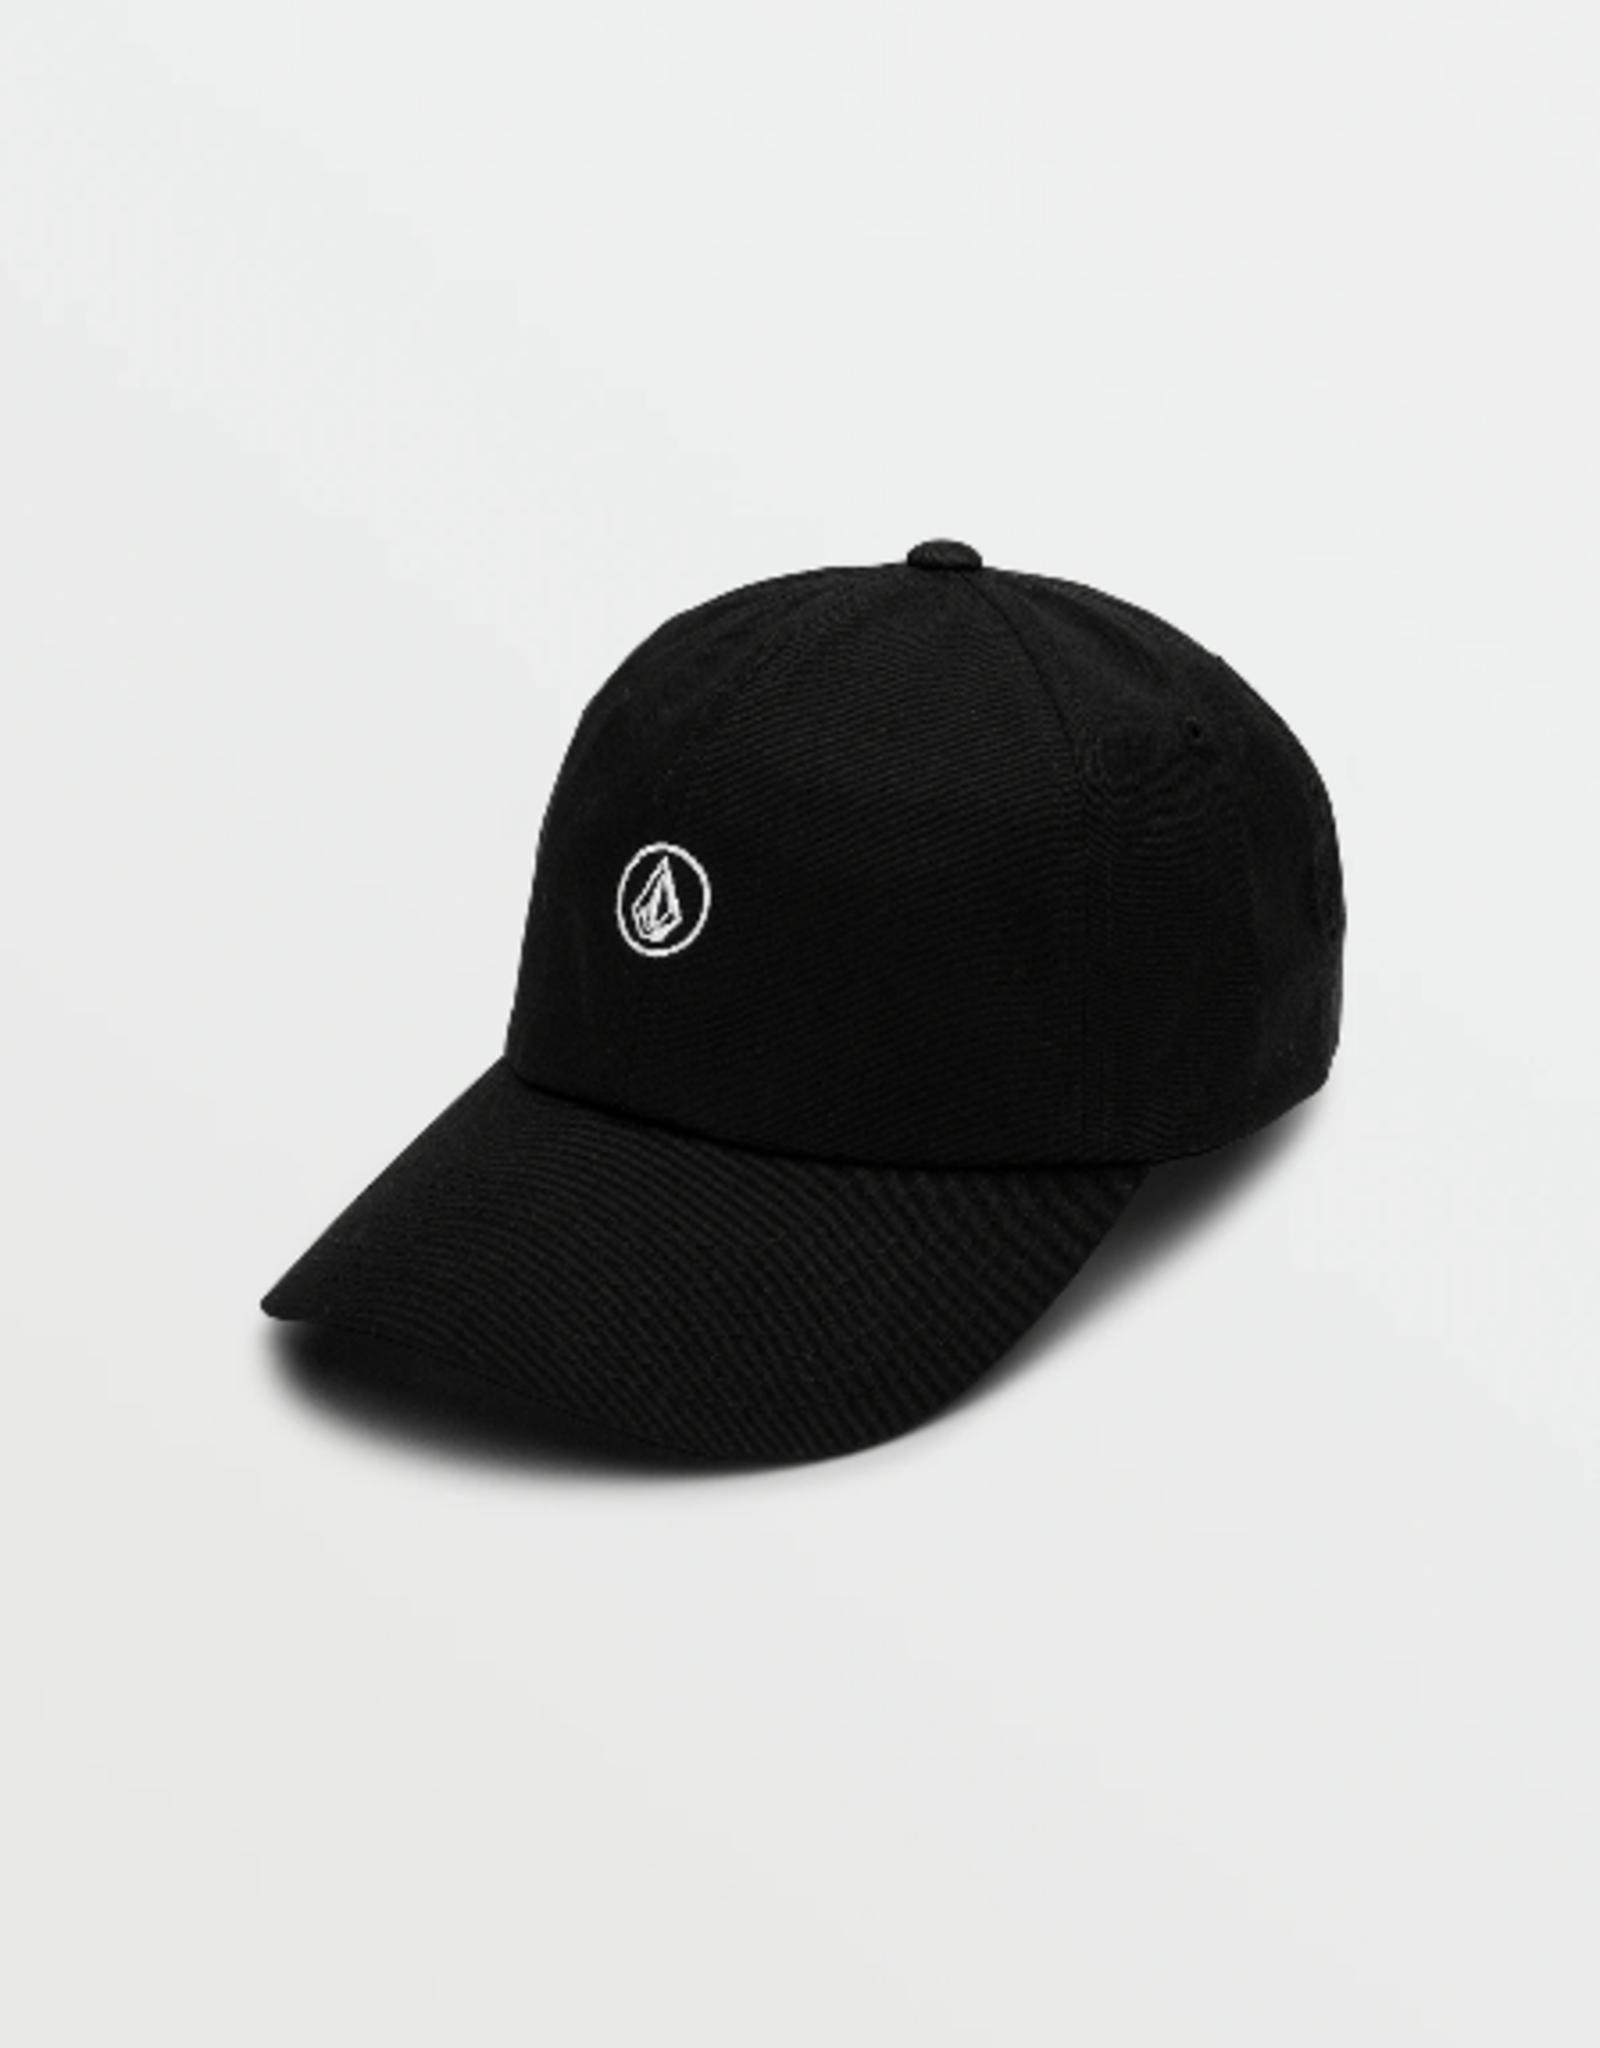 Volcom CIRCLE STONE DAD HAT BLACK